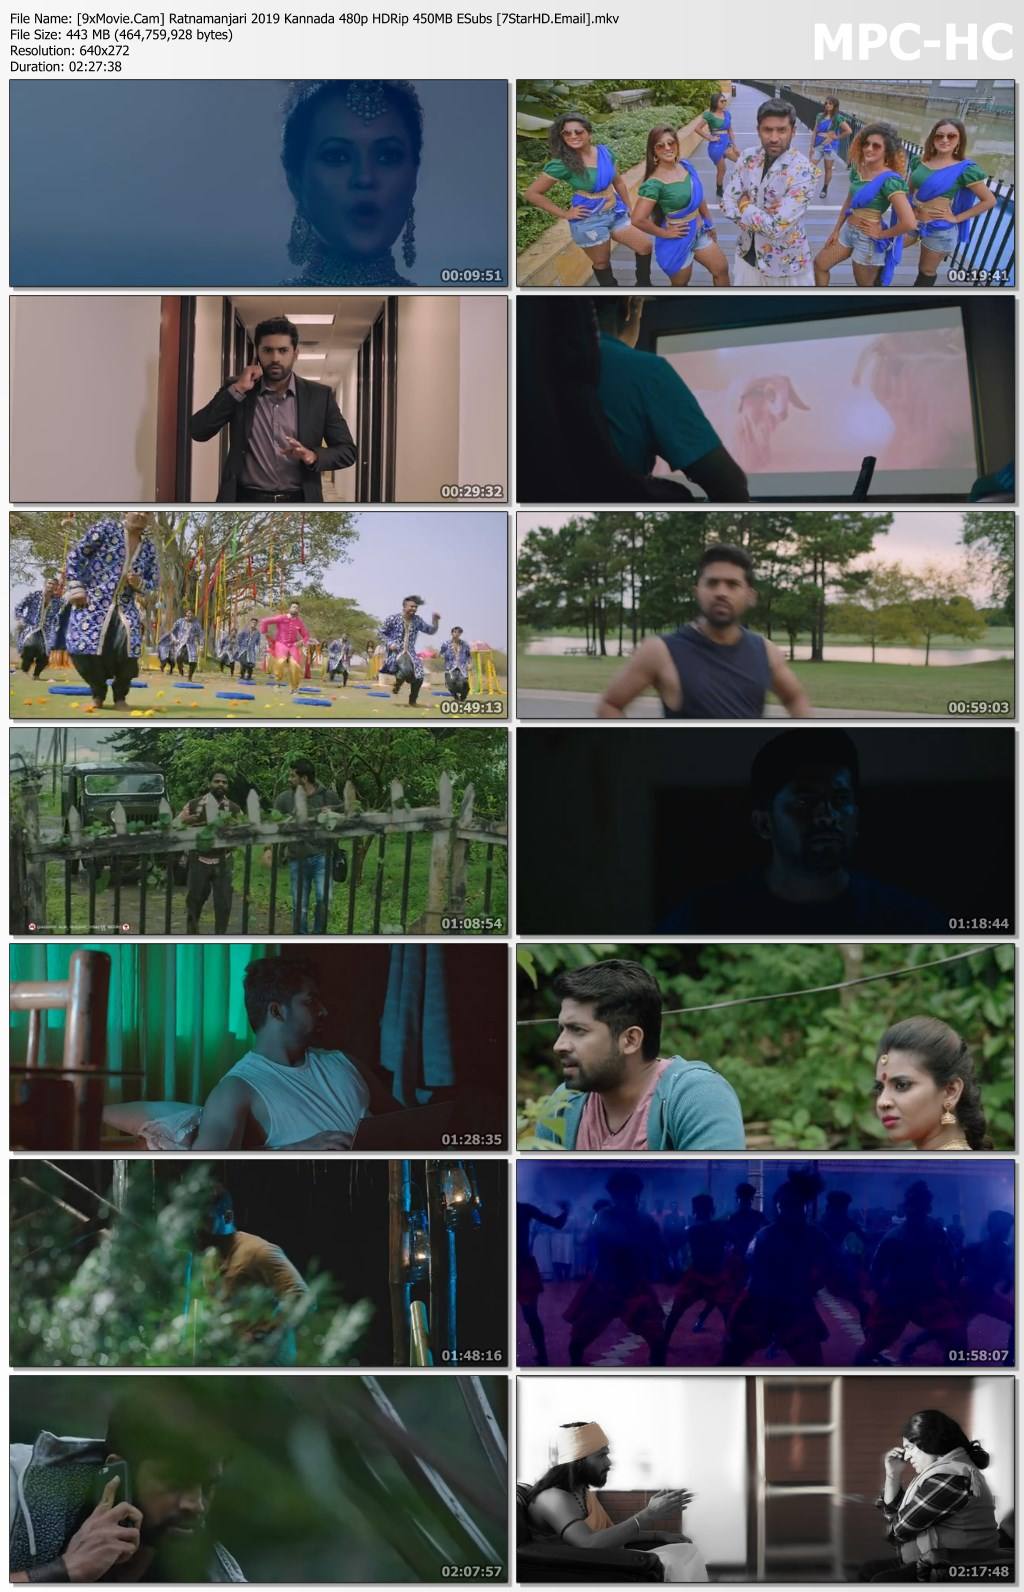 Ratnamanjari 2019 Kannada 480p HDRip x264 450MB ESubs